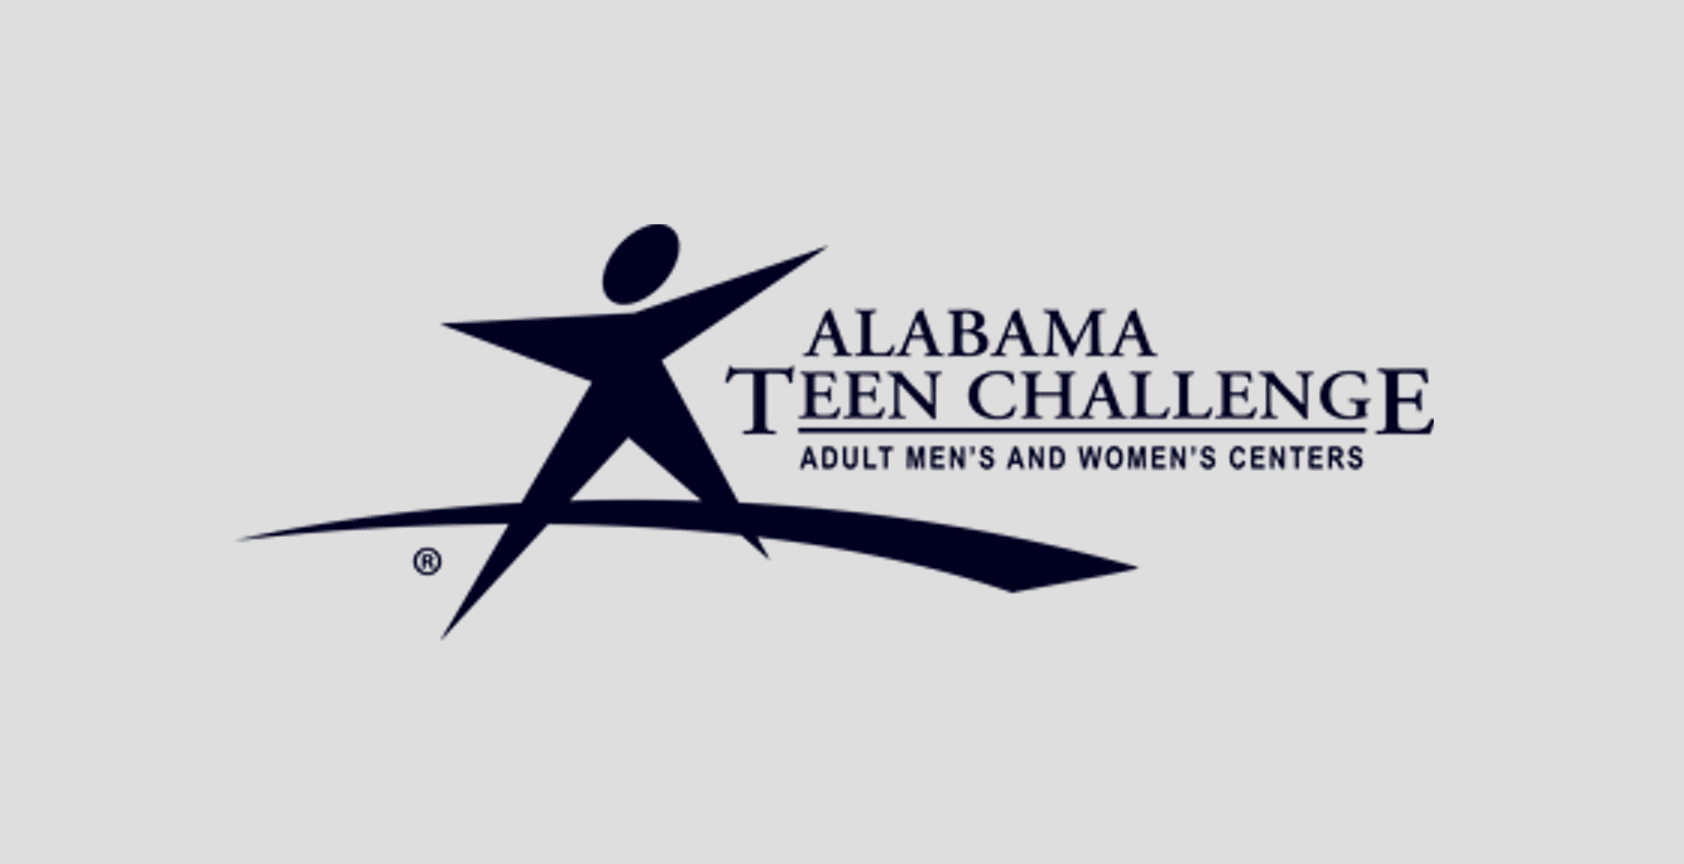 Alabama teen challenge women's center